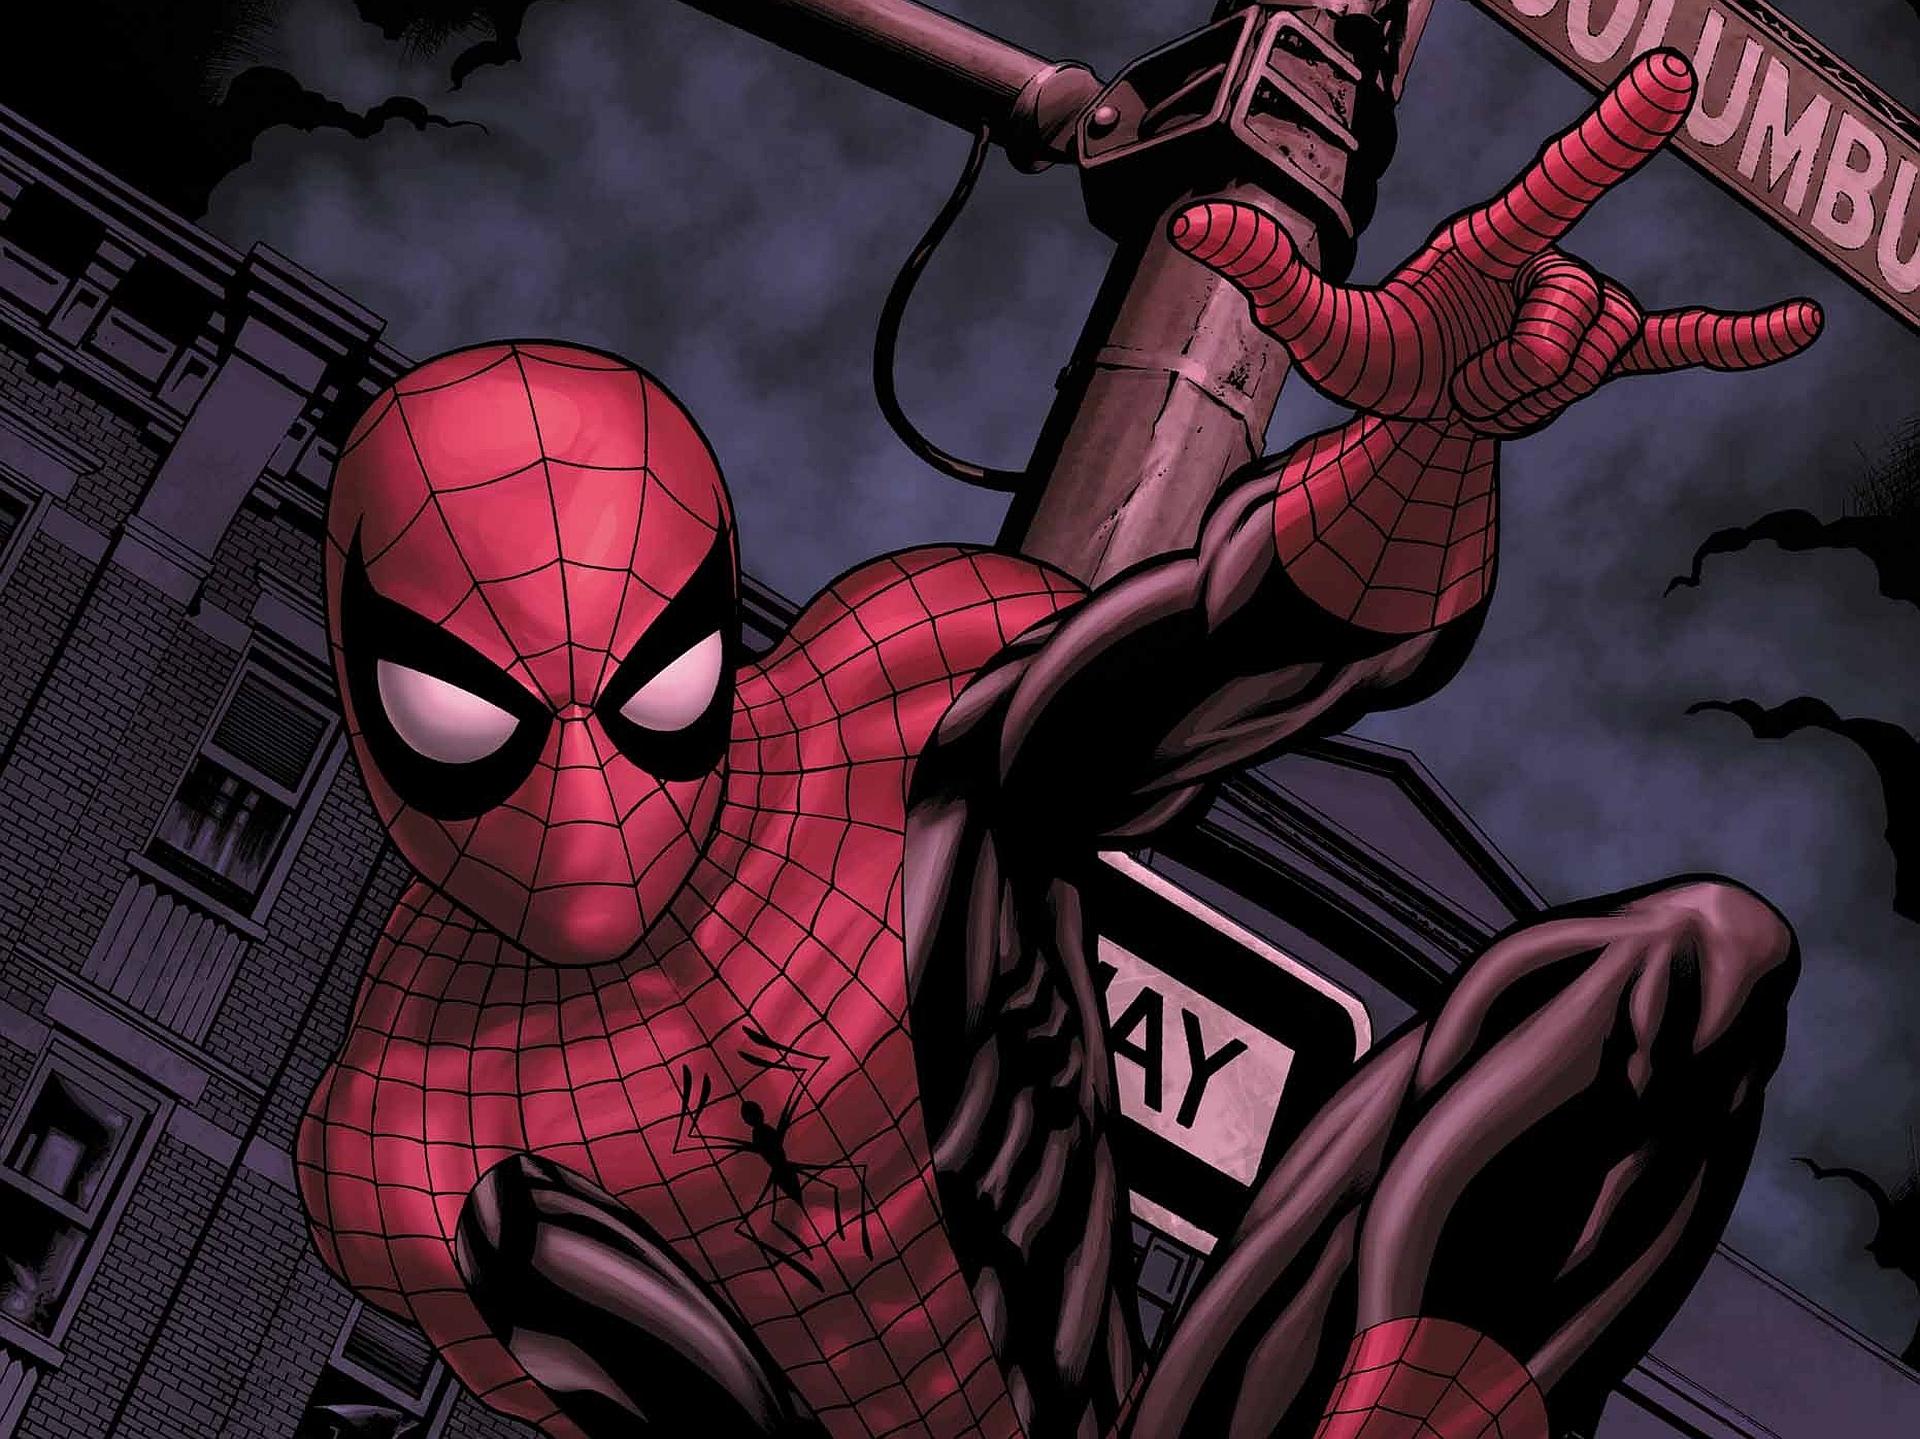 Spider man full hd fondo de pantalla and fondo de for Fondos de spiderman